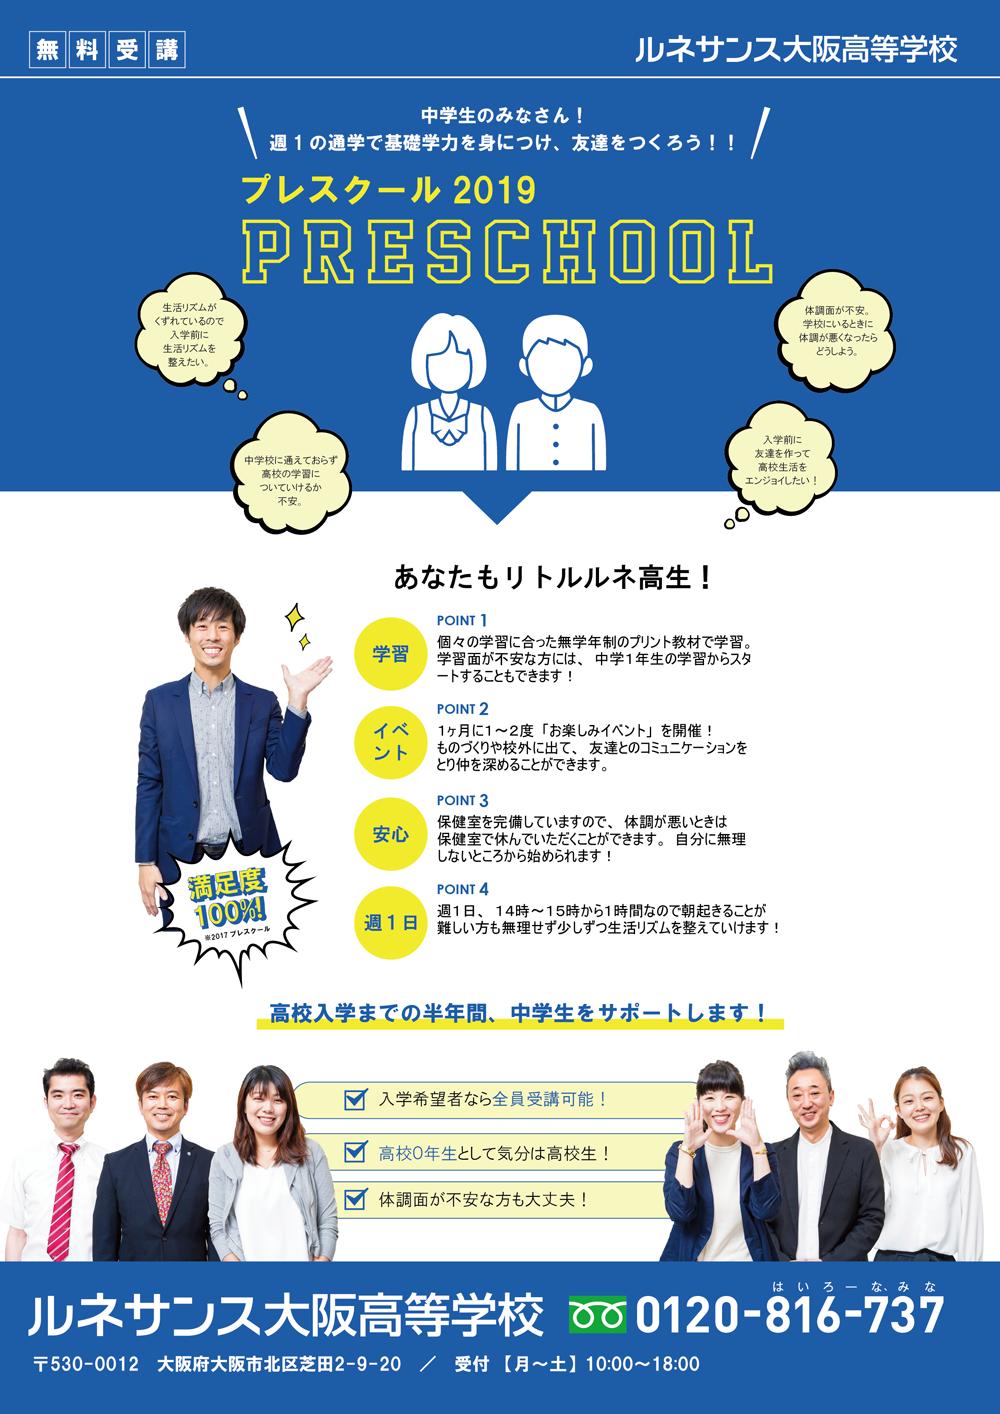 https://www.r-ac.jp/campus/osaka/blog/img/pre2019omote.png